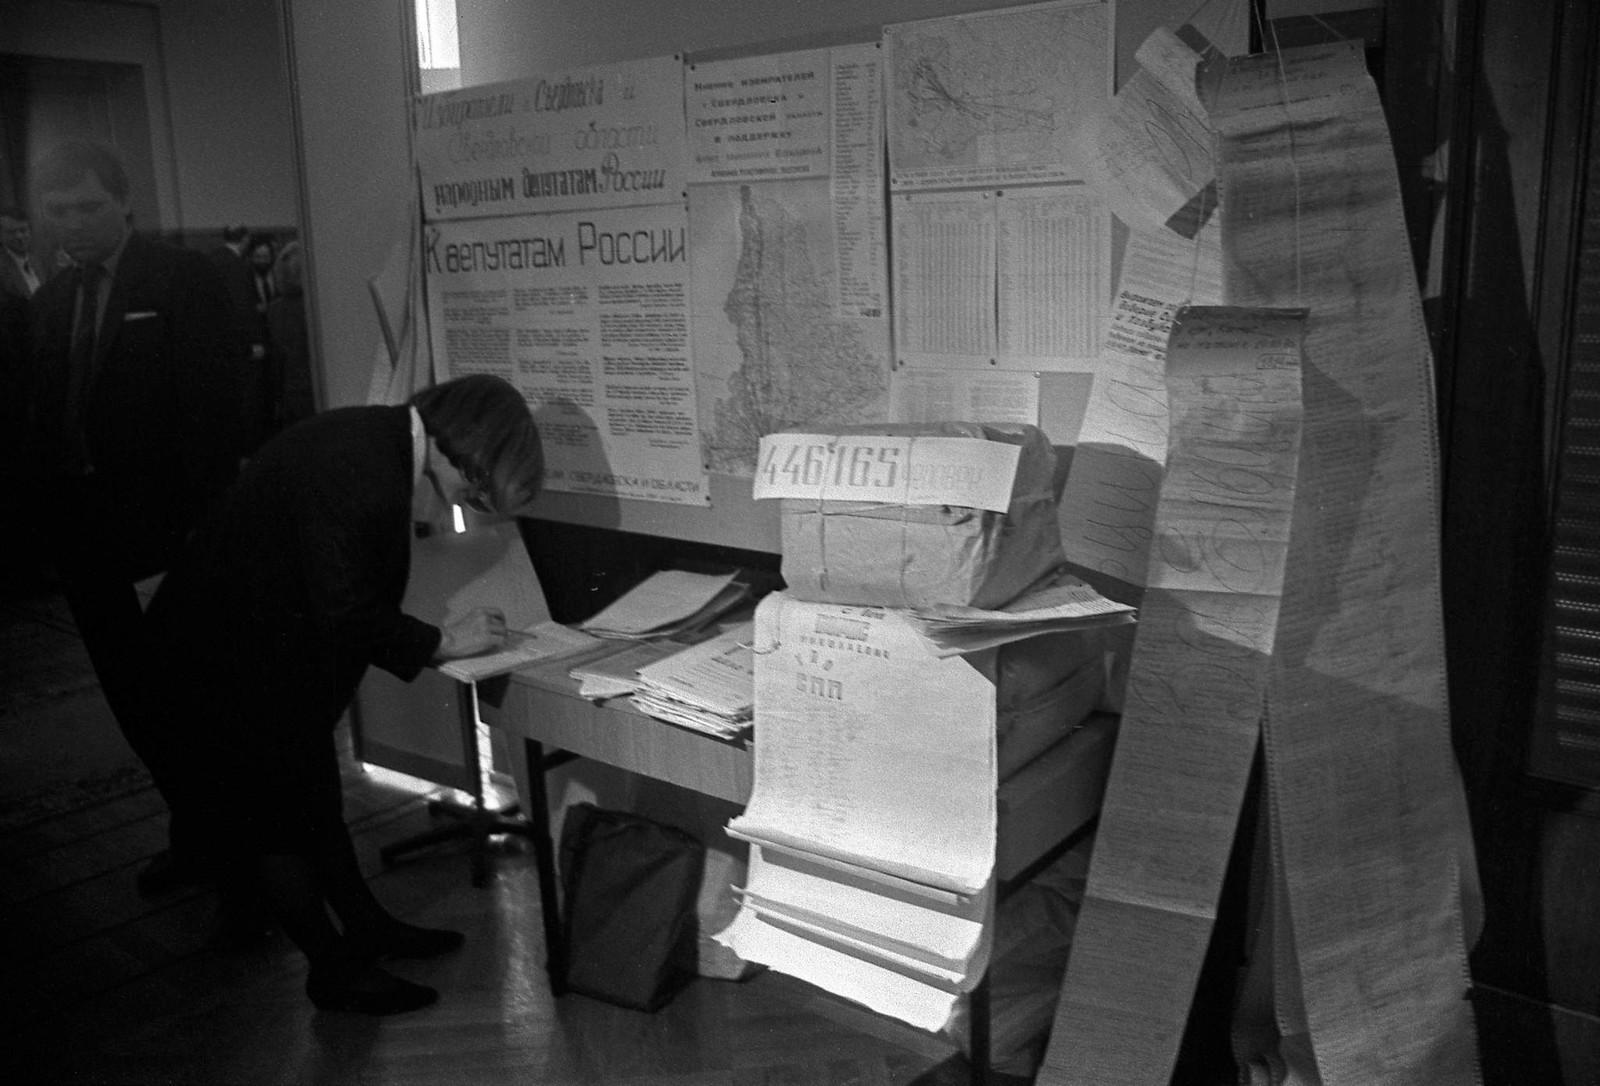 1991. Третий съезд депутатов РСФСР